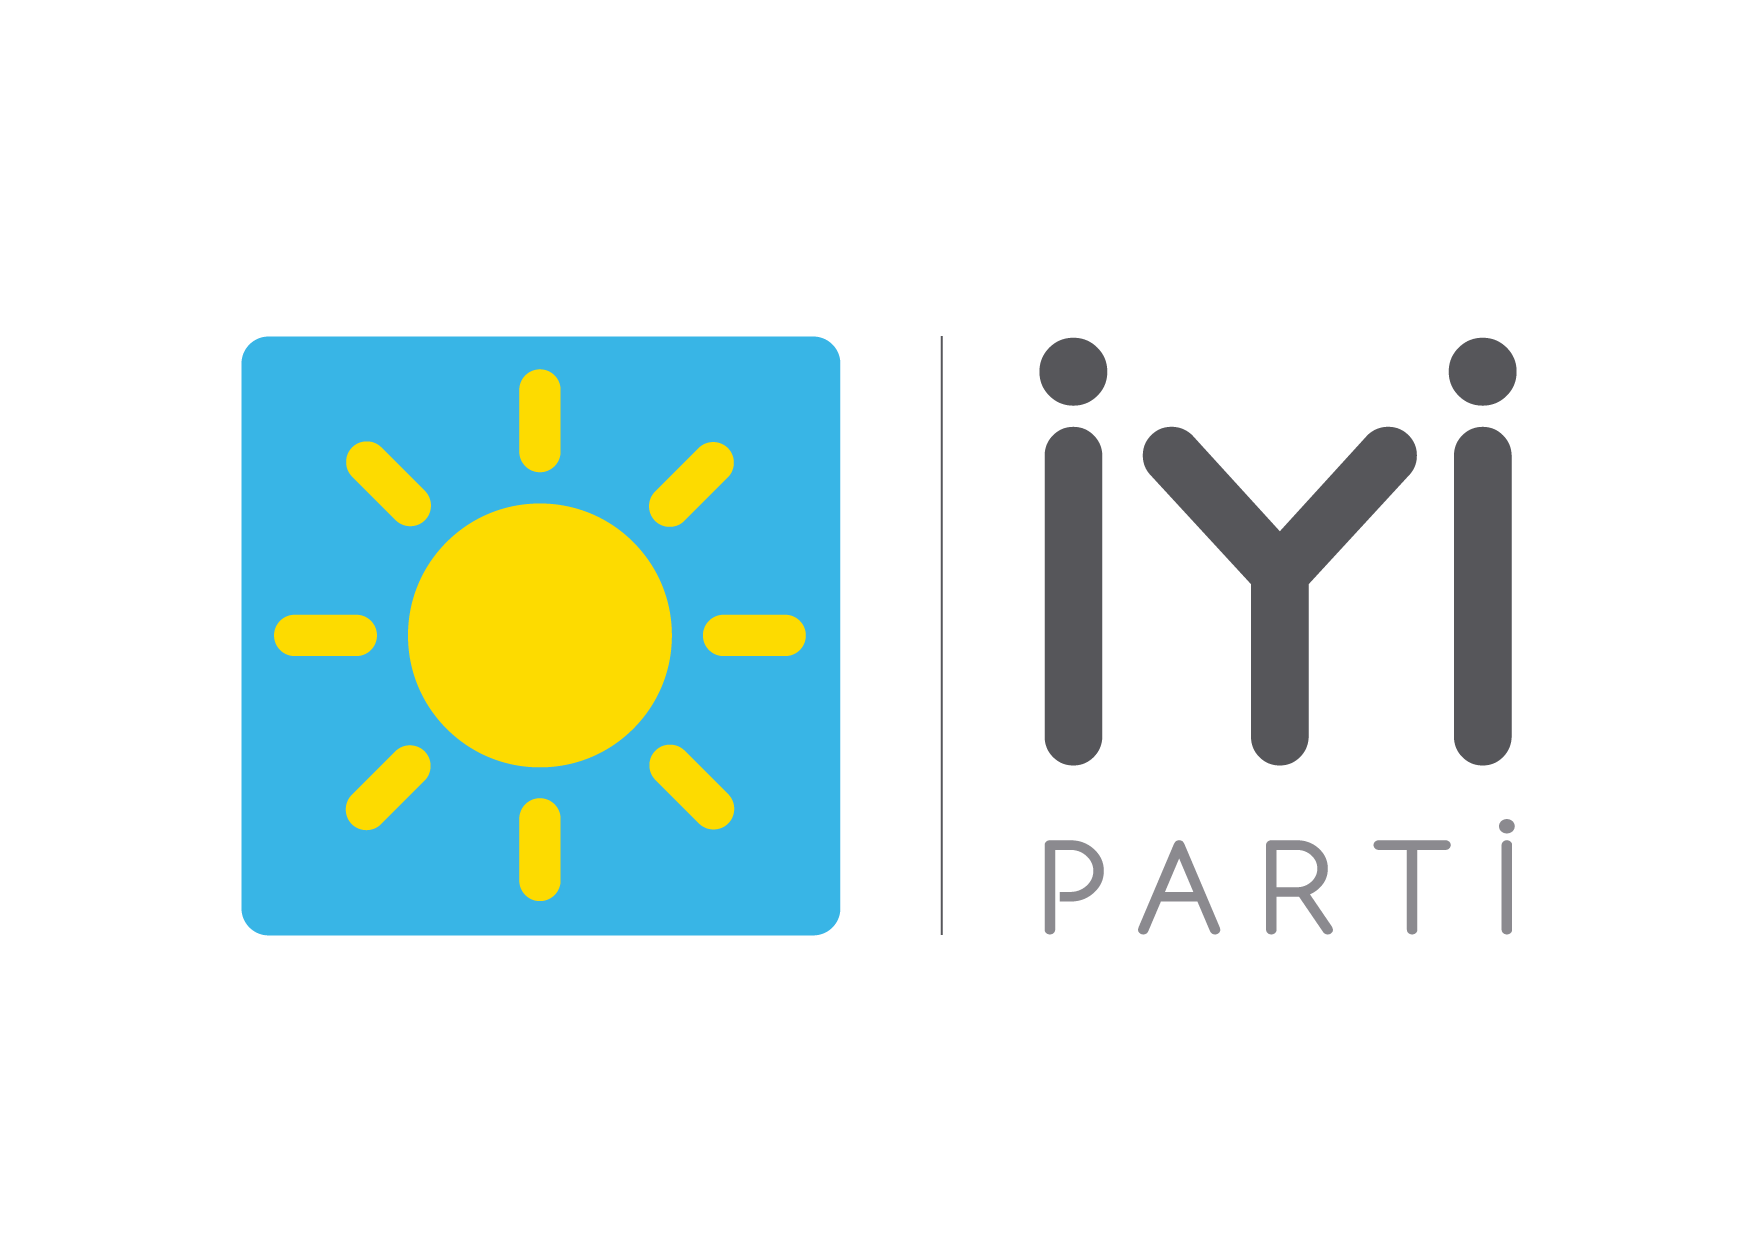 İyi Parti Logo Vektörel Çizim